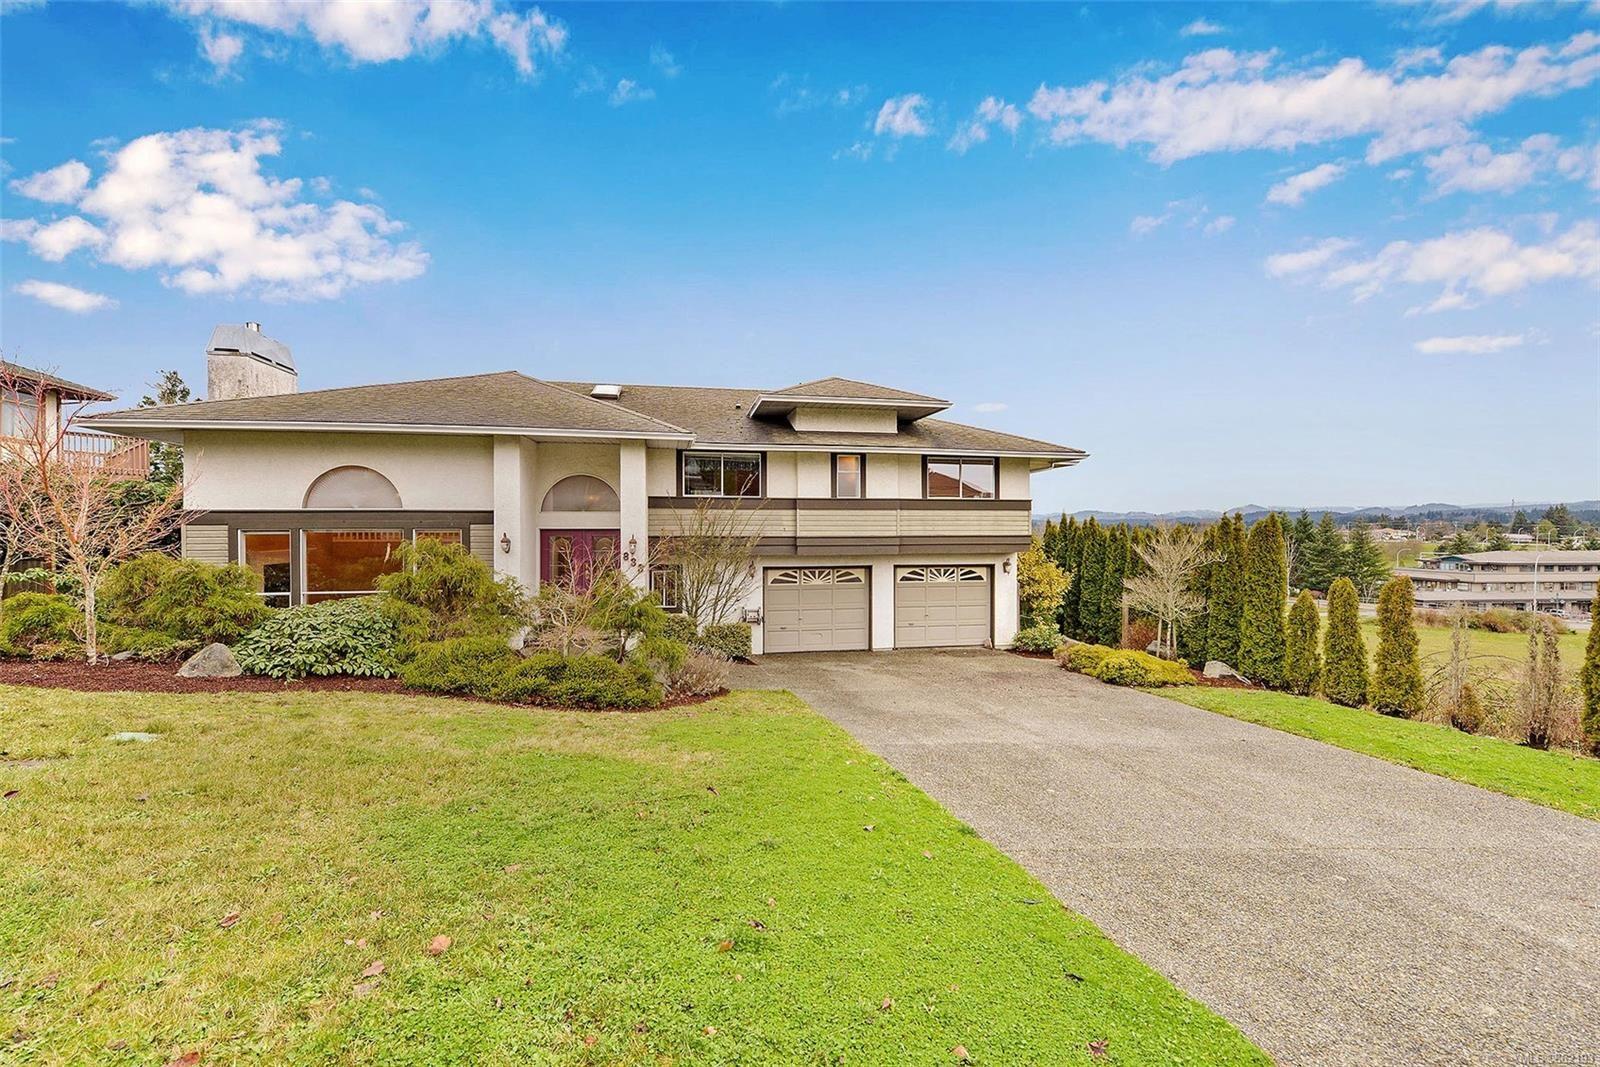 Main Photo: 833 Maltwood Terr in : SE Broadmead House for sale (Saanich East)  : MLS®# 862193